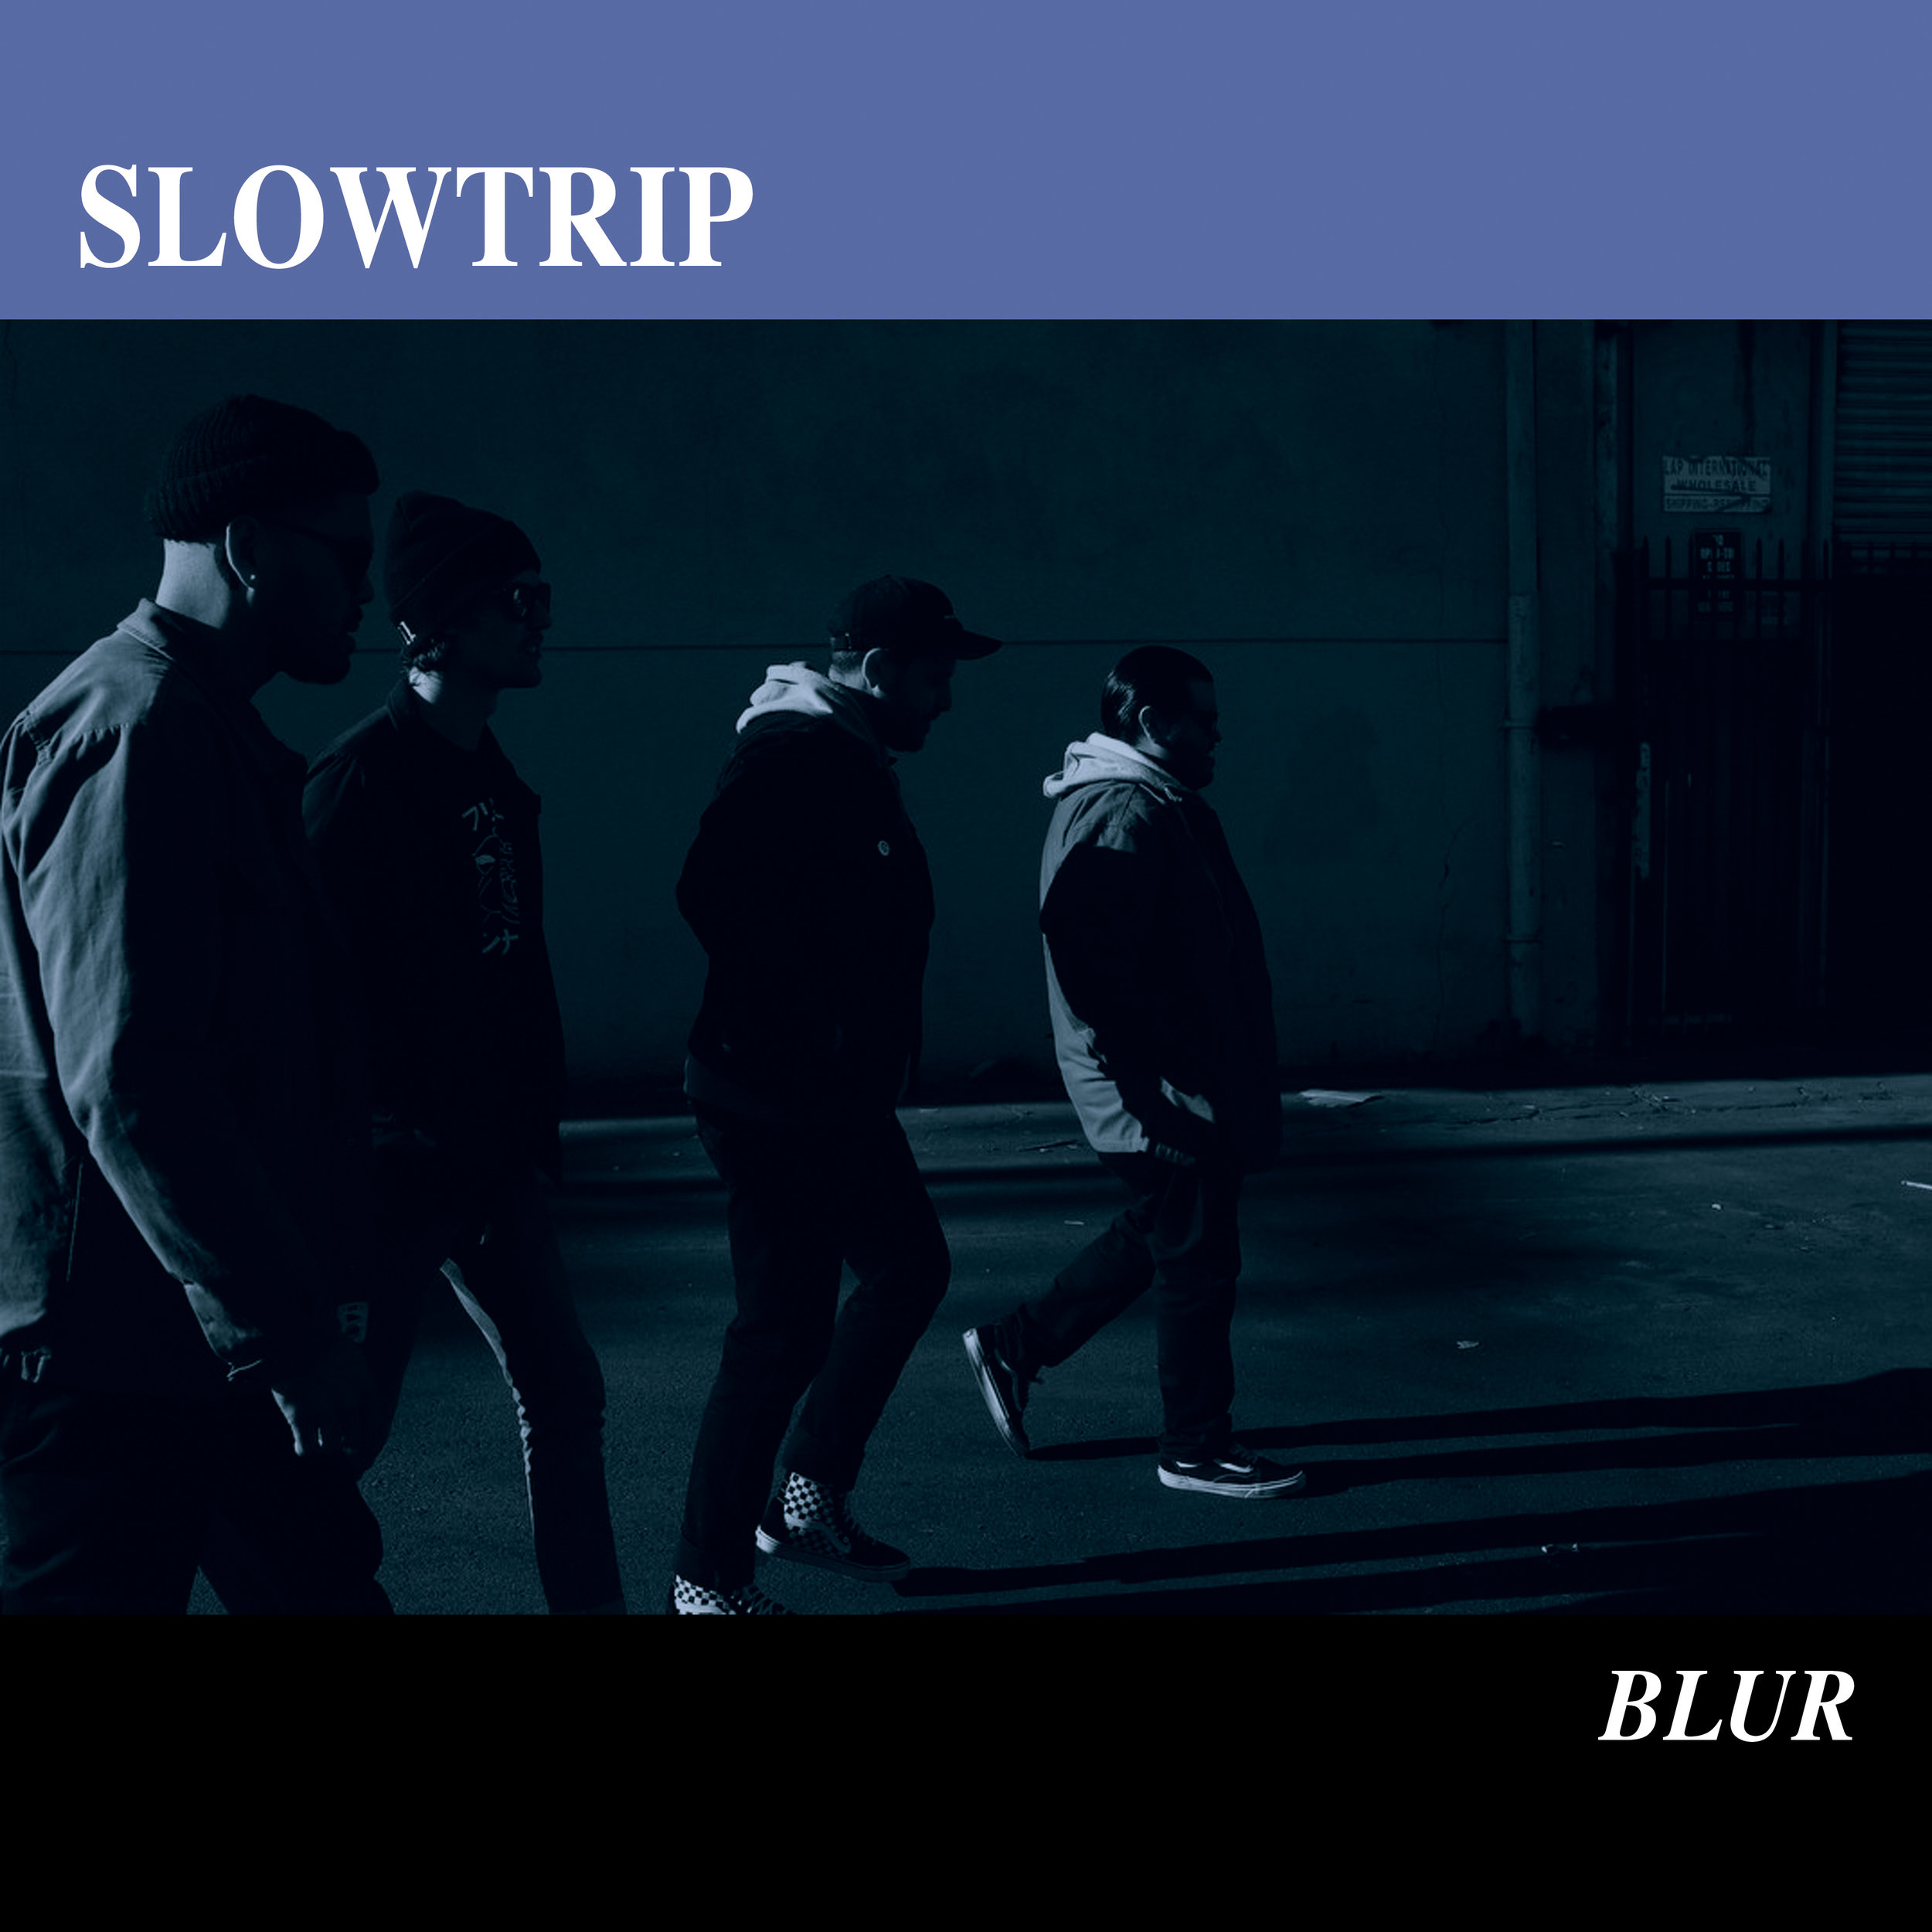 SLOWTRIP_Blur_Final RGB.jpg